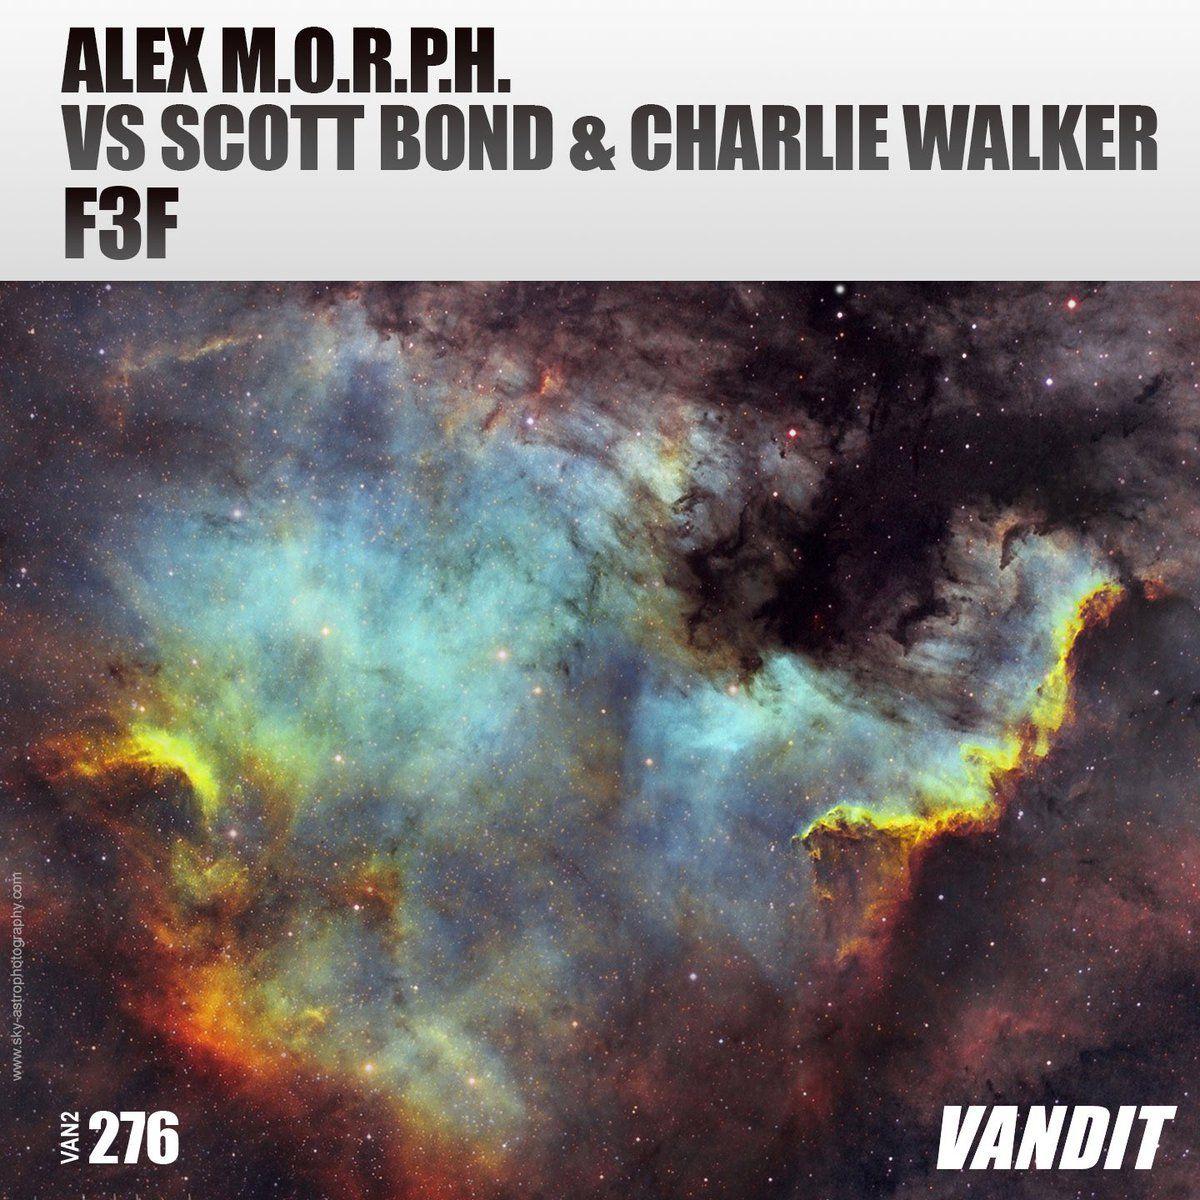 alex_m.o.r.p.h._vs_scott_bond_charlie_walker_-_f3f_original_mix.jpg